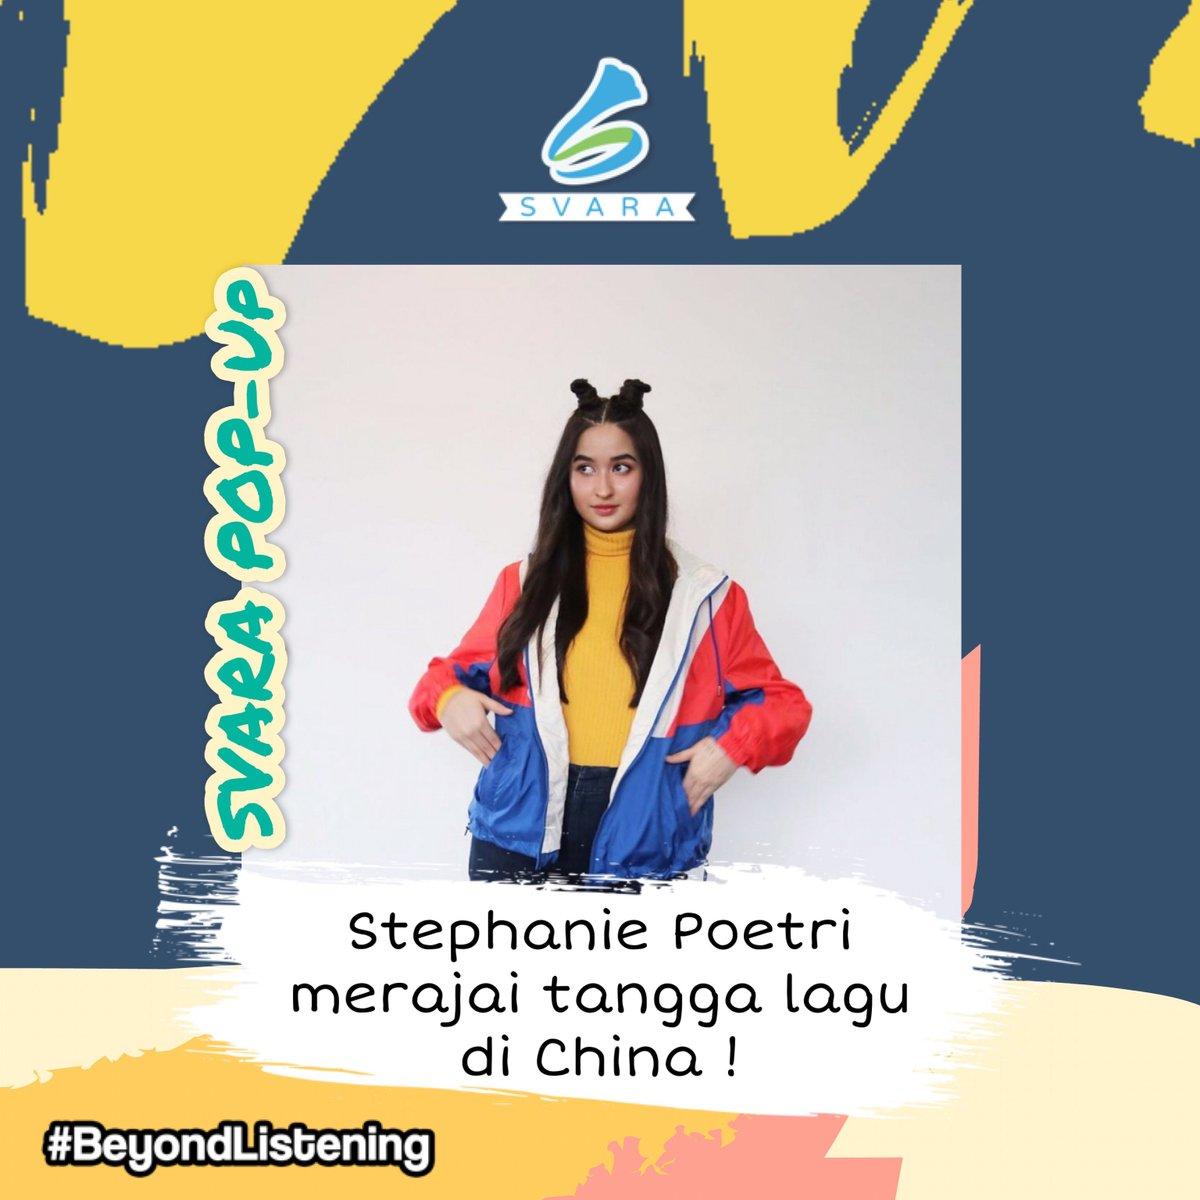 Berkolaborasi bersama rapper asal Hongkong 'Jackson Wang' membawa berkah bagi Stephanie Poetri. Lagu 'I Love You 3000 II' sudah didengarkan lebih dari 53 juta kali di dunia dan video musiknya di Youtube sudah disaksikan lebih dari 6,2 juta kali, loh! .  #beyondlistening pic.twitter.com/YdIaWTNDYr